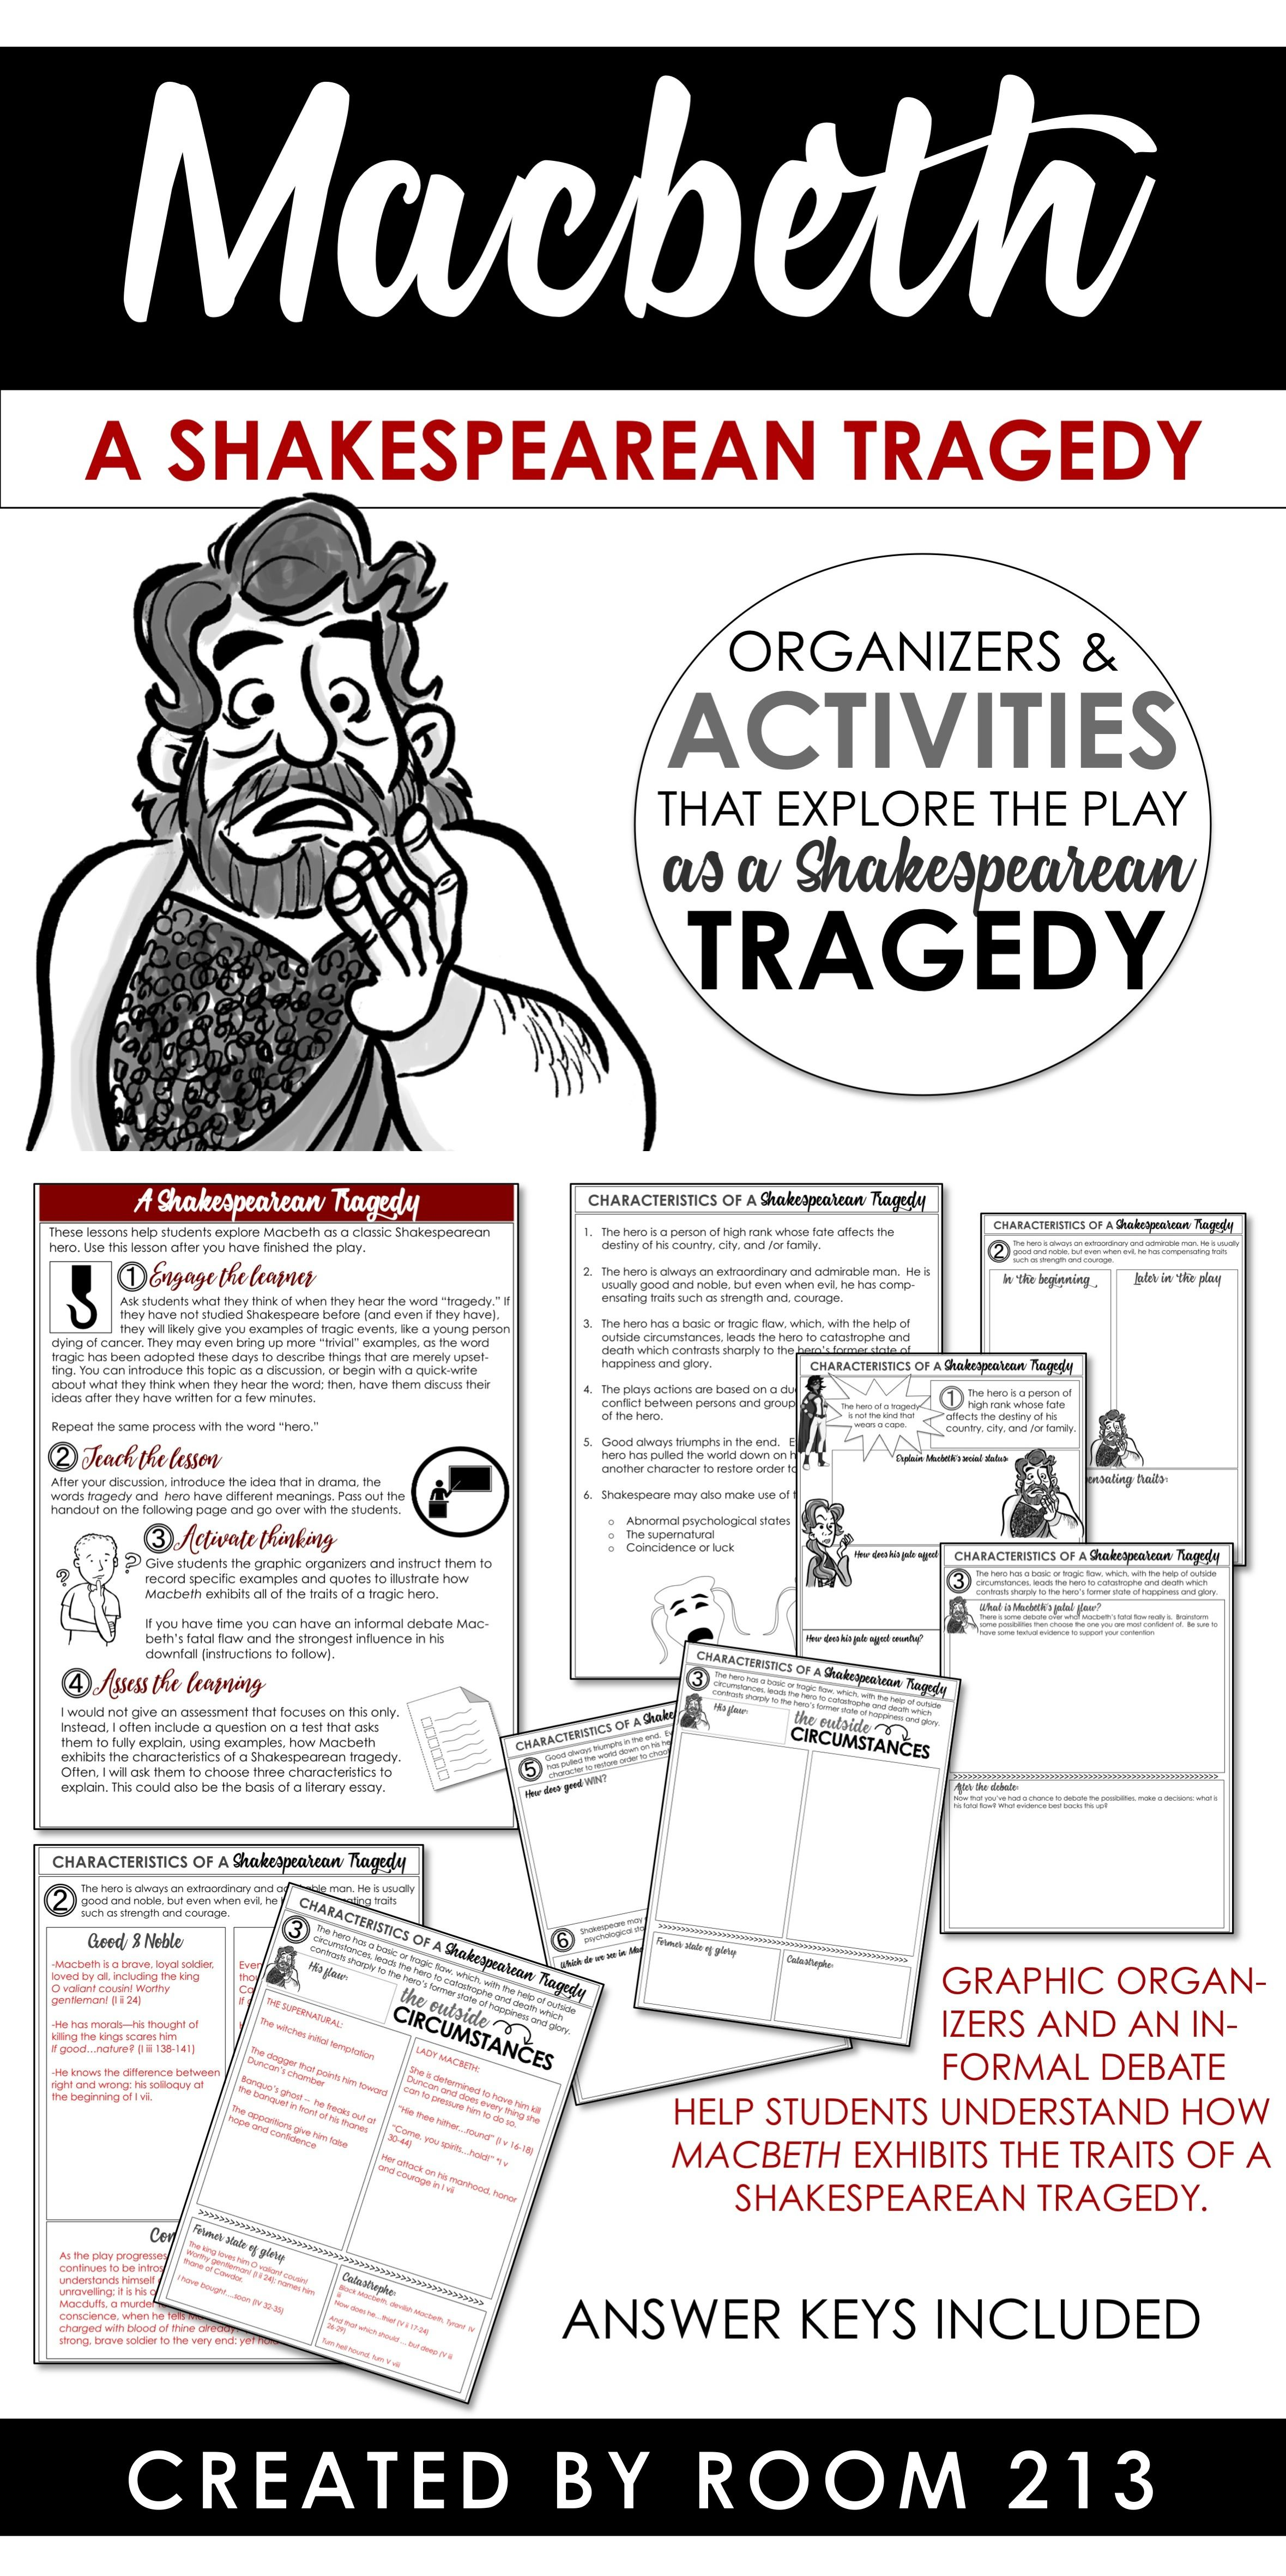 Macbeth A Shakespearean Tragedy Lesson Teaching Shakespeare Act 3 Scene 1 Analysis